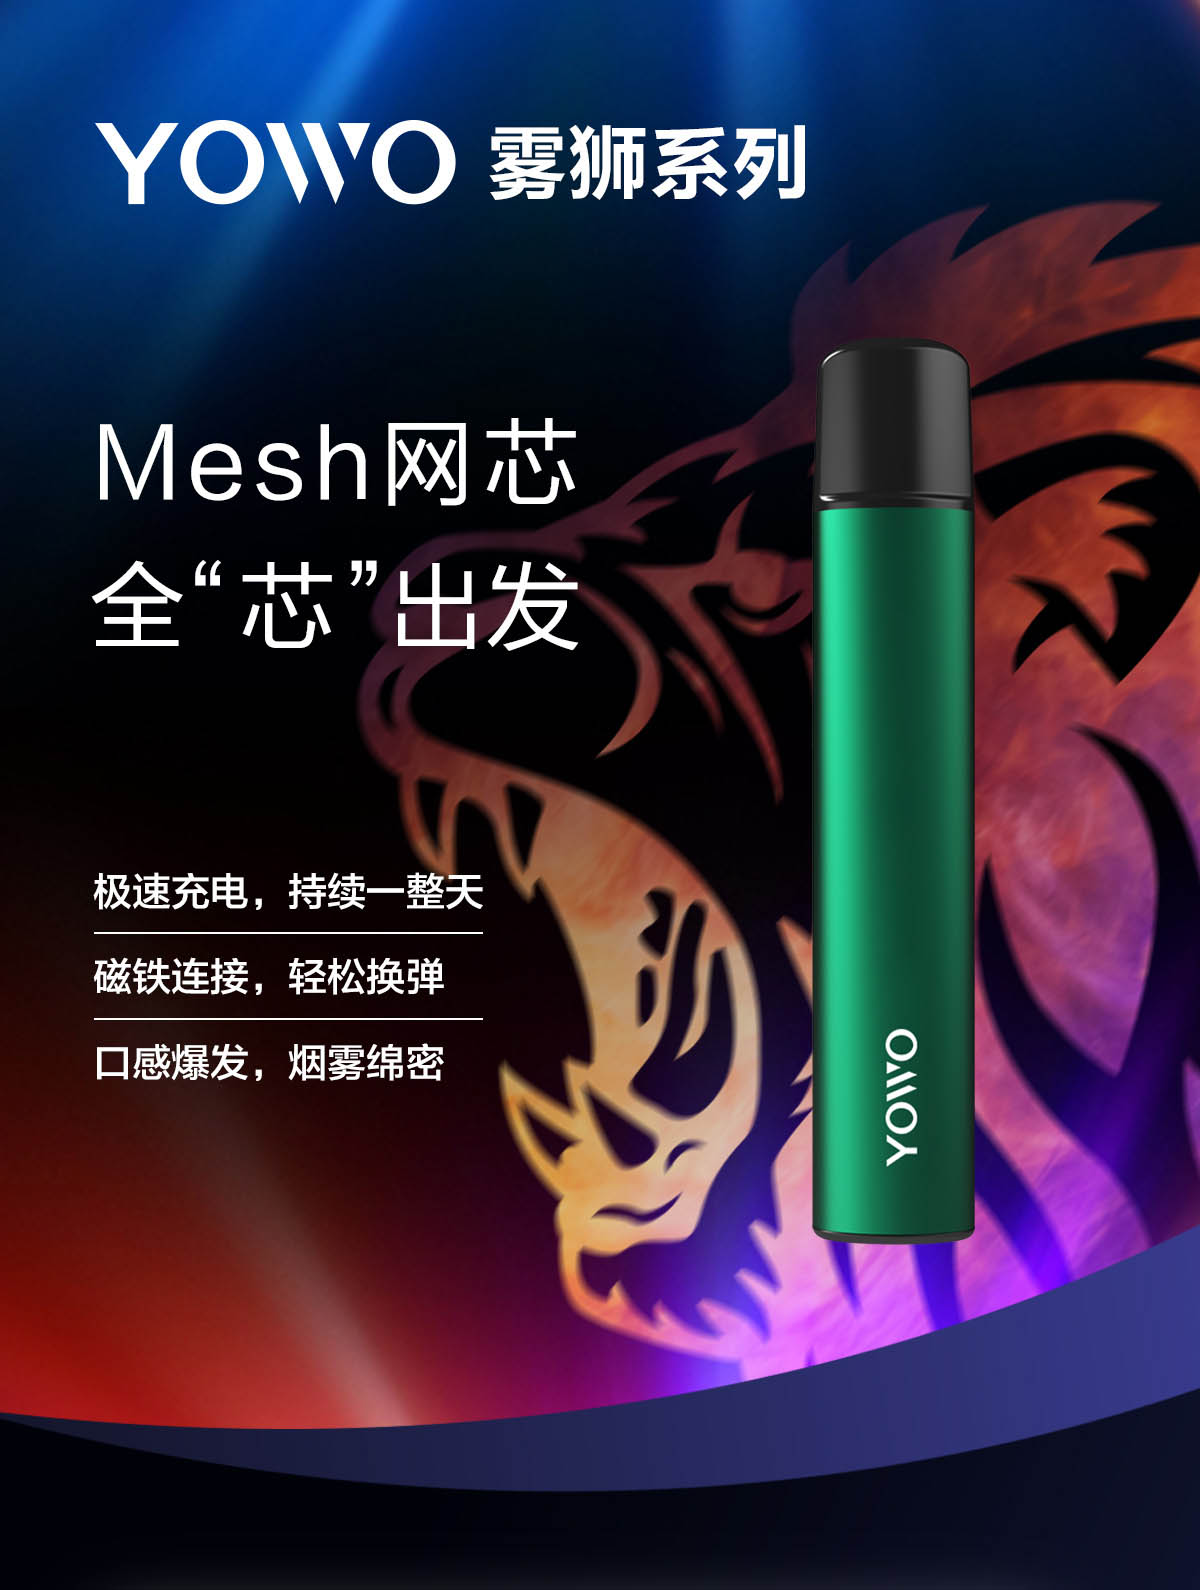 x4 雾化电子烟